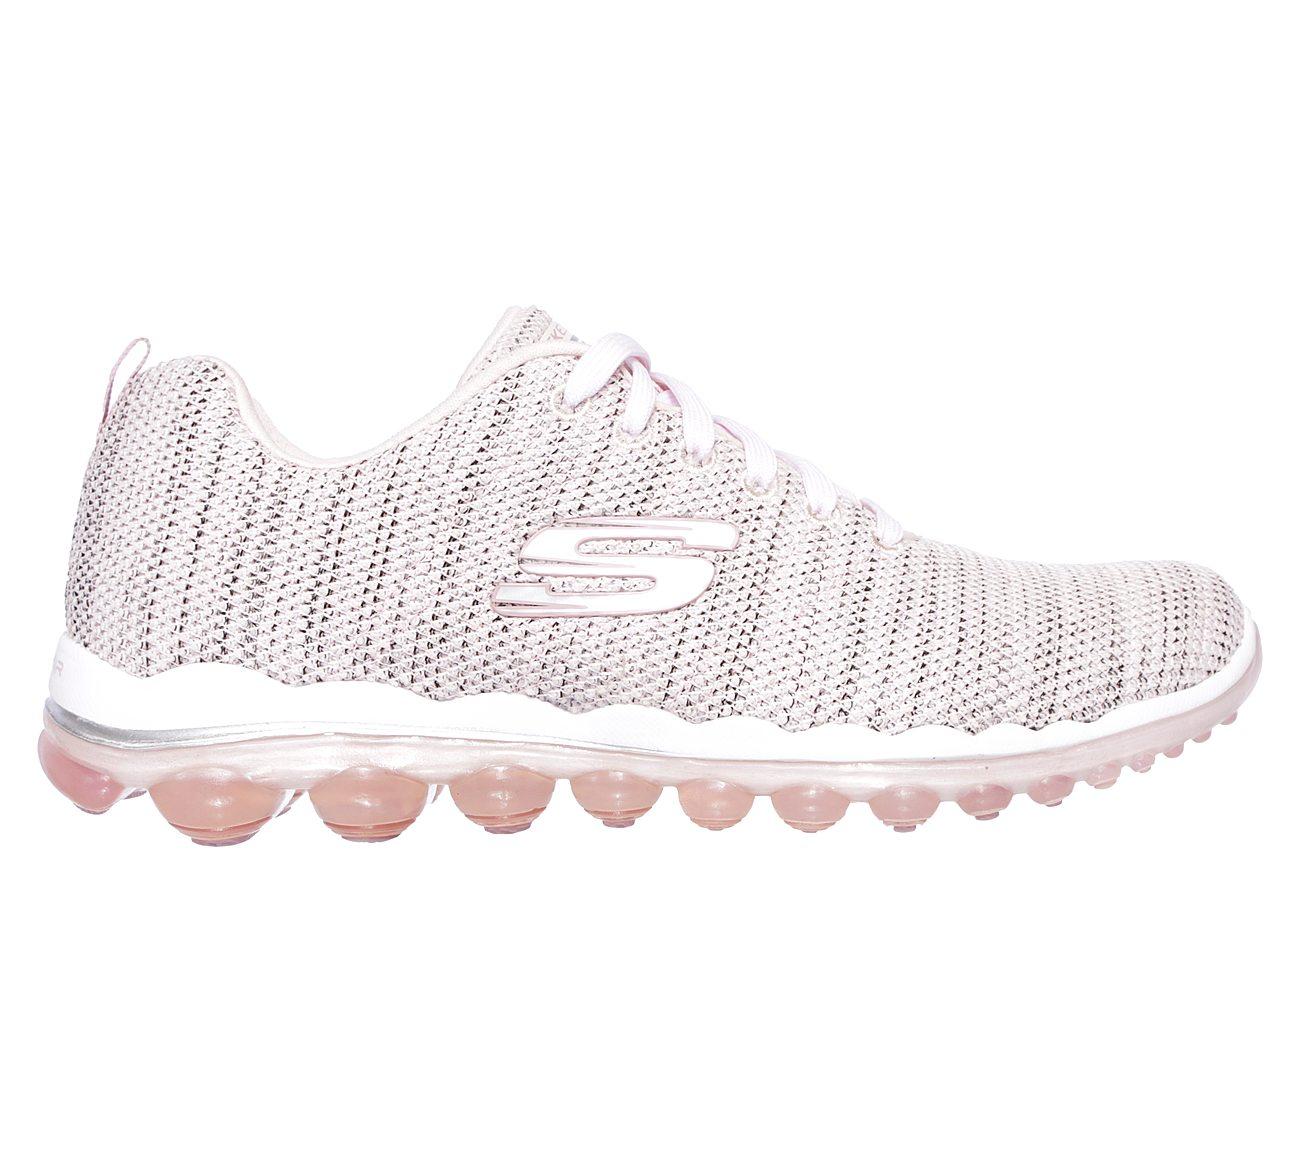 skechers women's skech air shoes in white